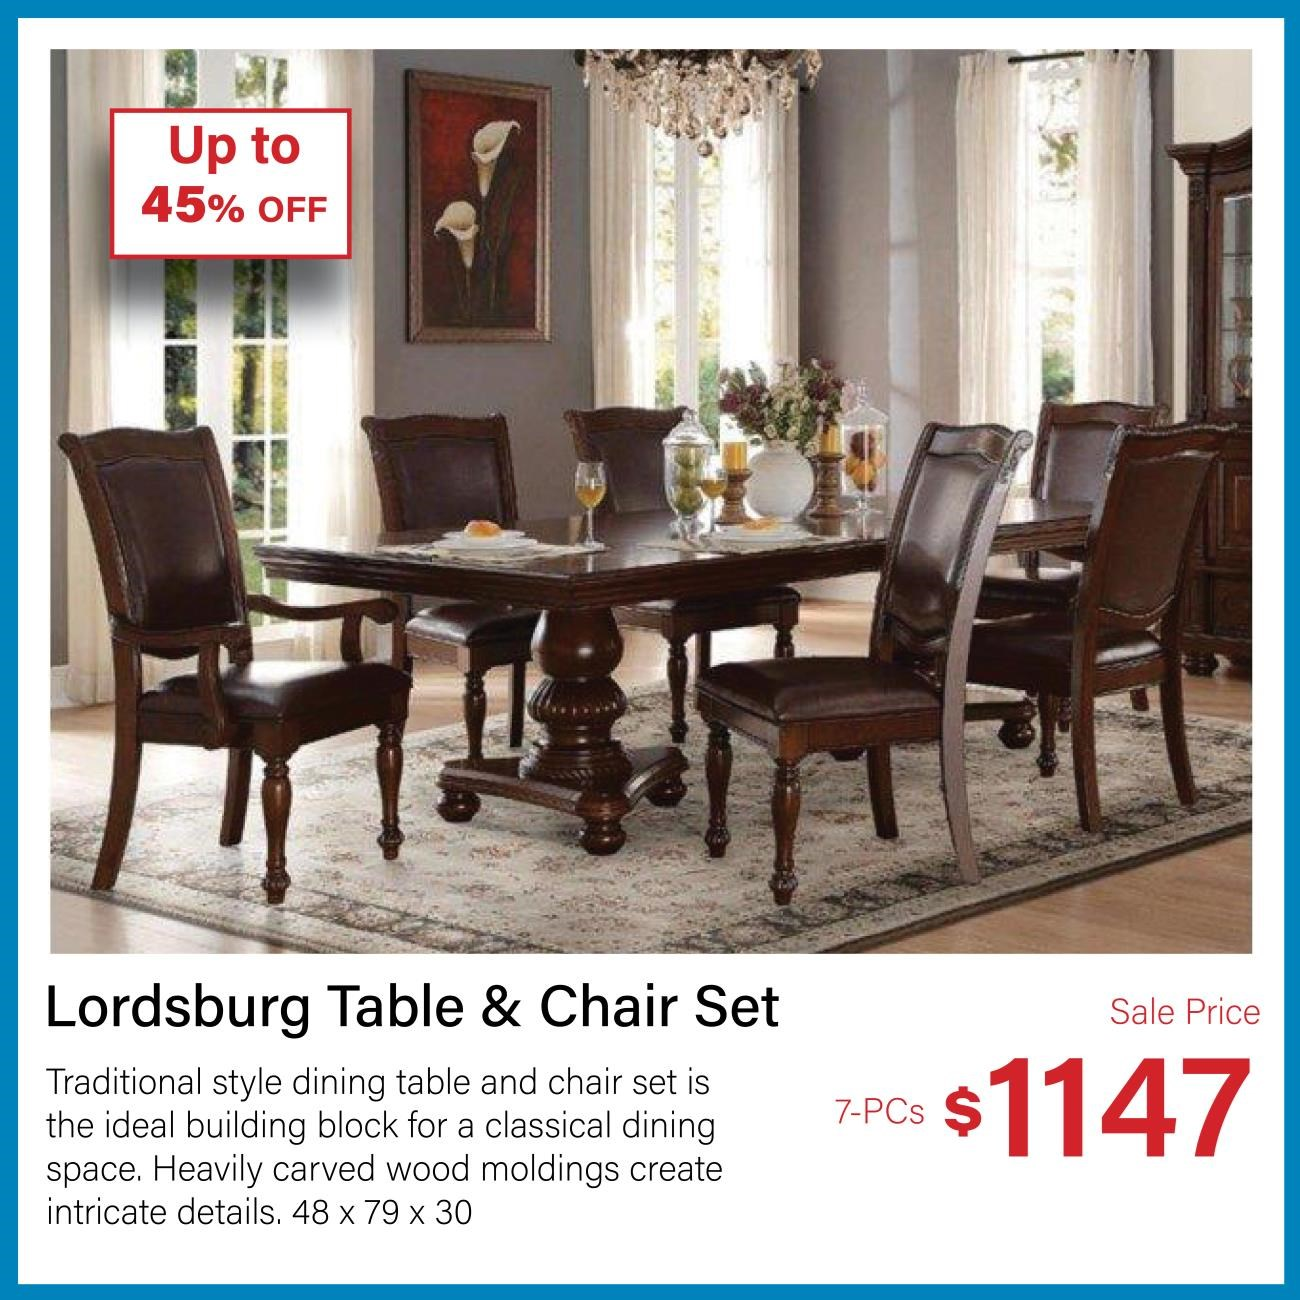 lordsburg table and chair set